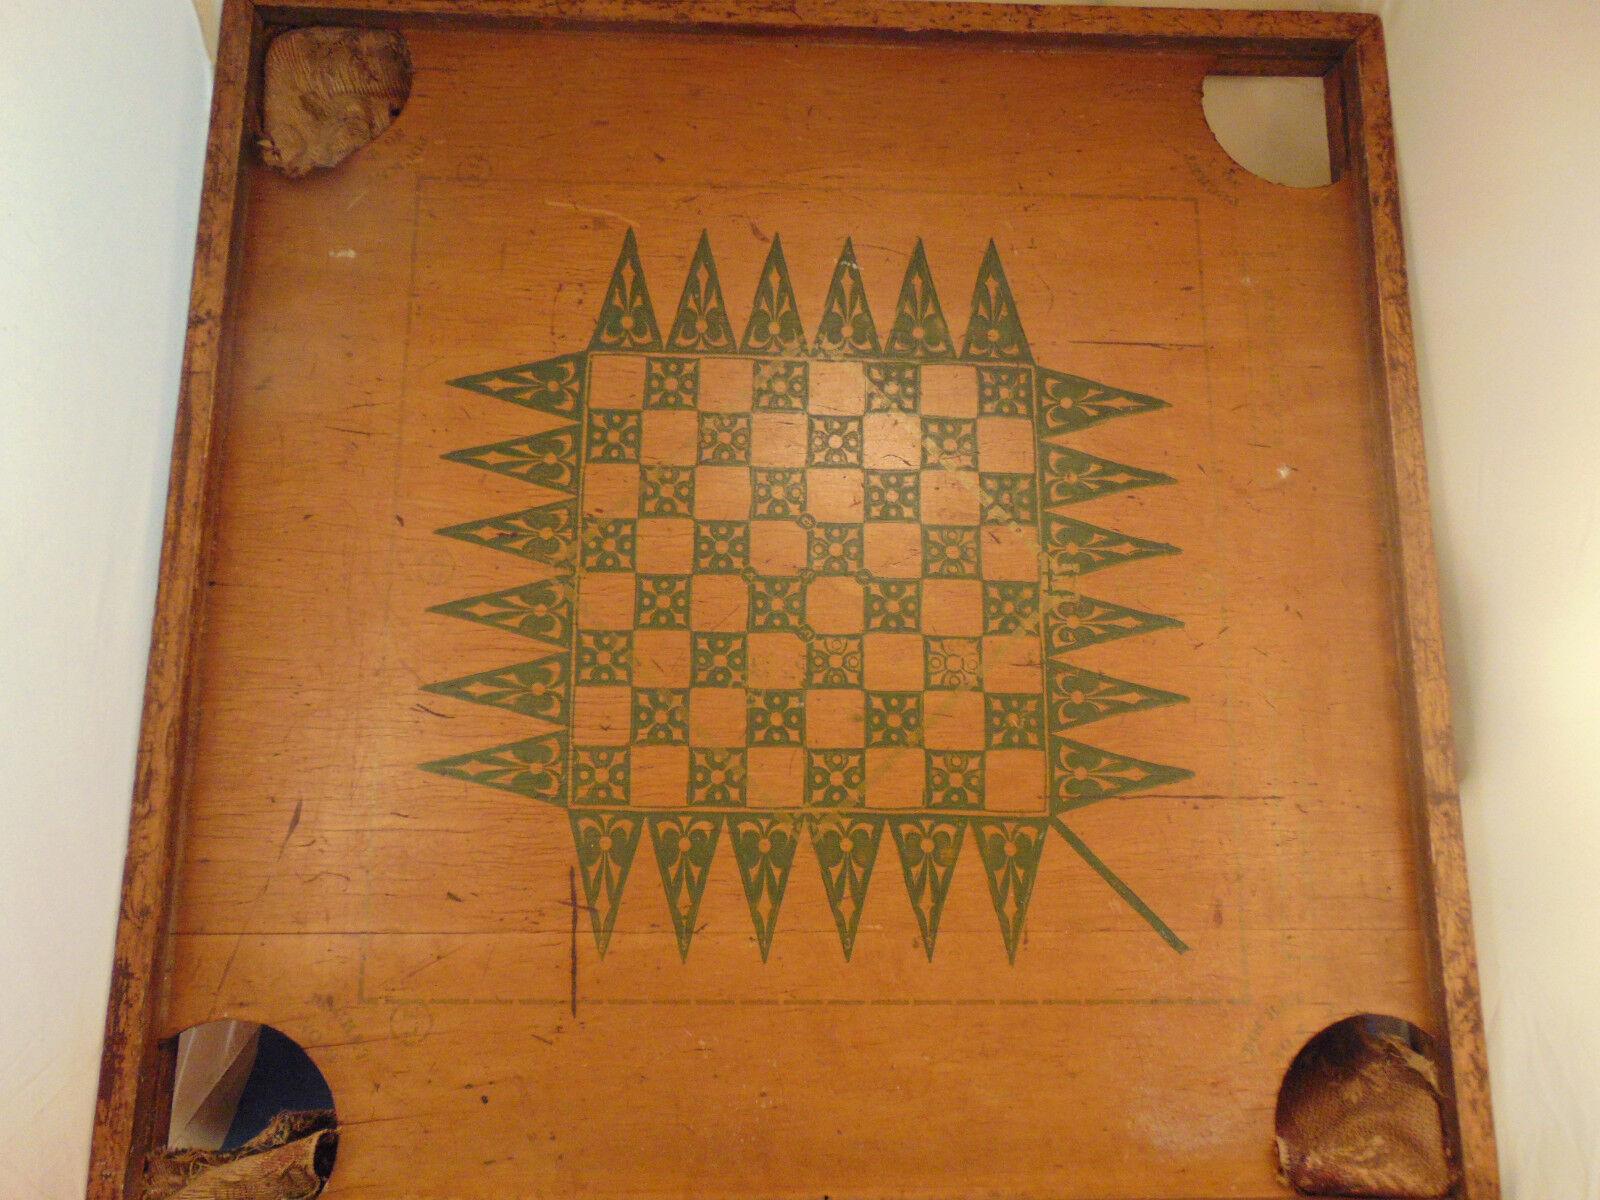 Placa De Madera Antiguo Mesa 29  bolsillos Cuadrado Ajedrez Damas primitivo Arte Antiguo